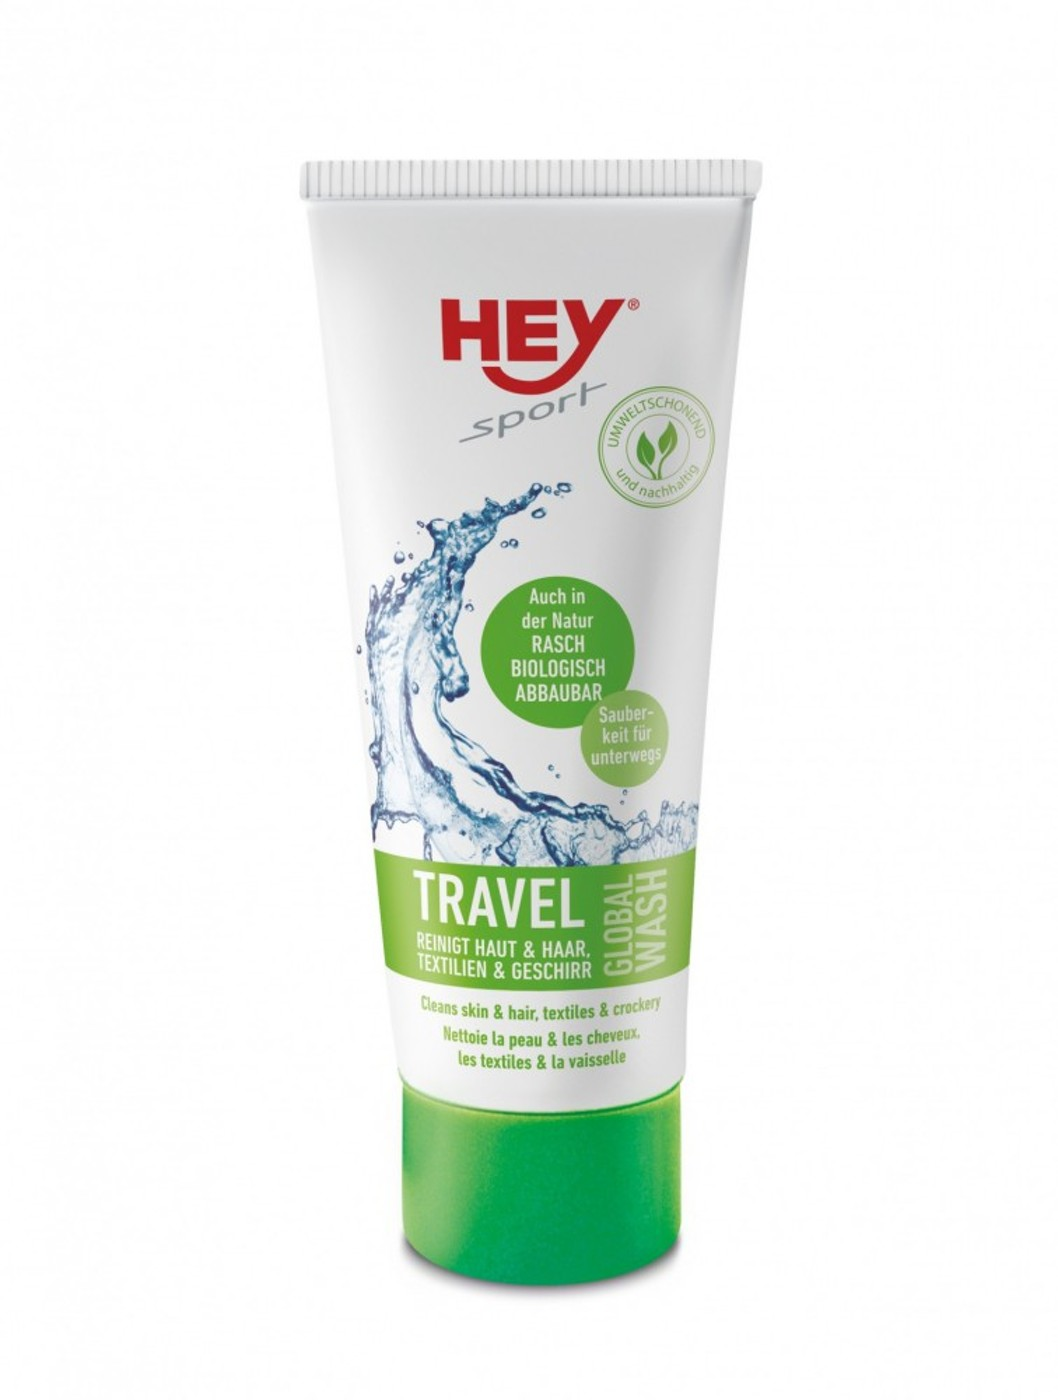 HEY SPORT Global Wash